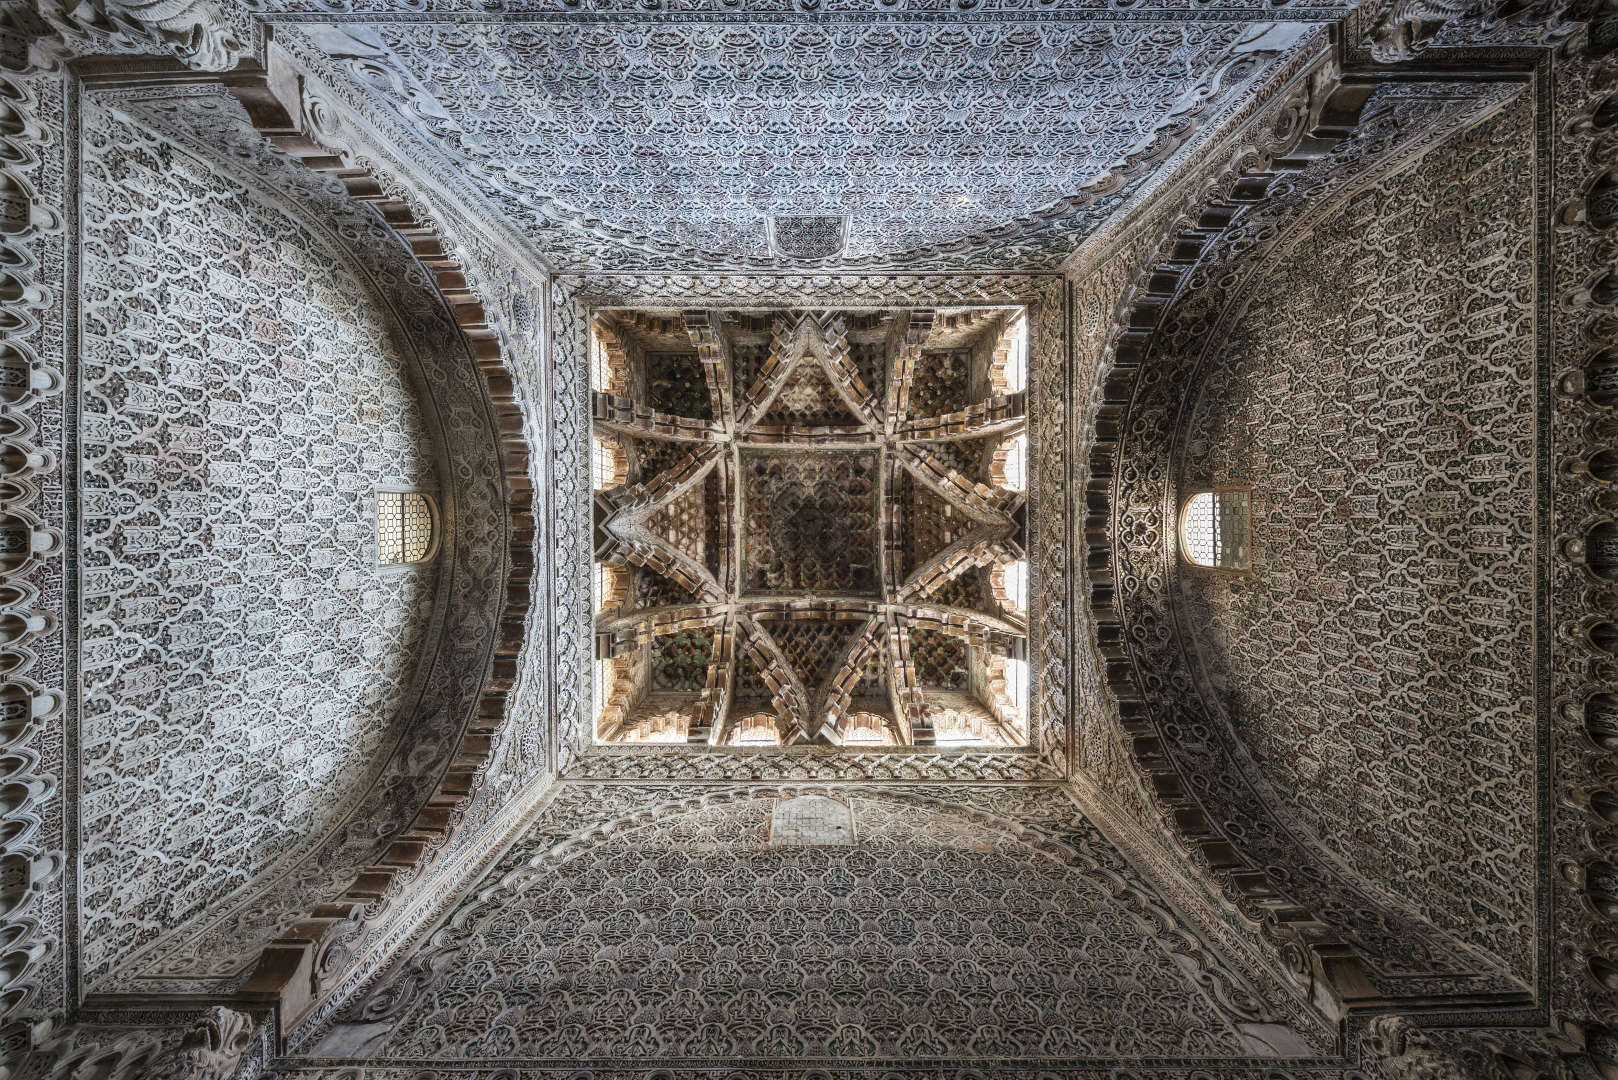 Las 10 curiosidades de la Mezquita-Catedral de Córdoba que no conocías | OWAY Tours